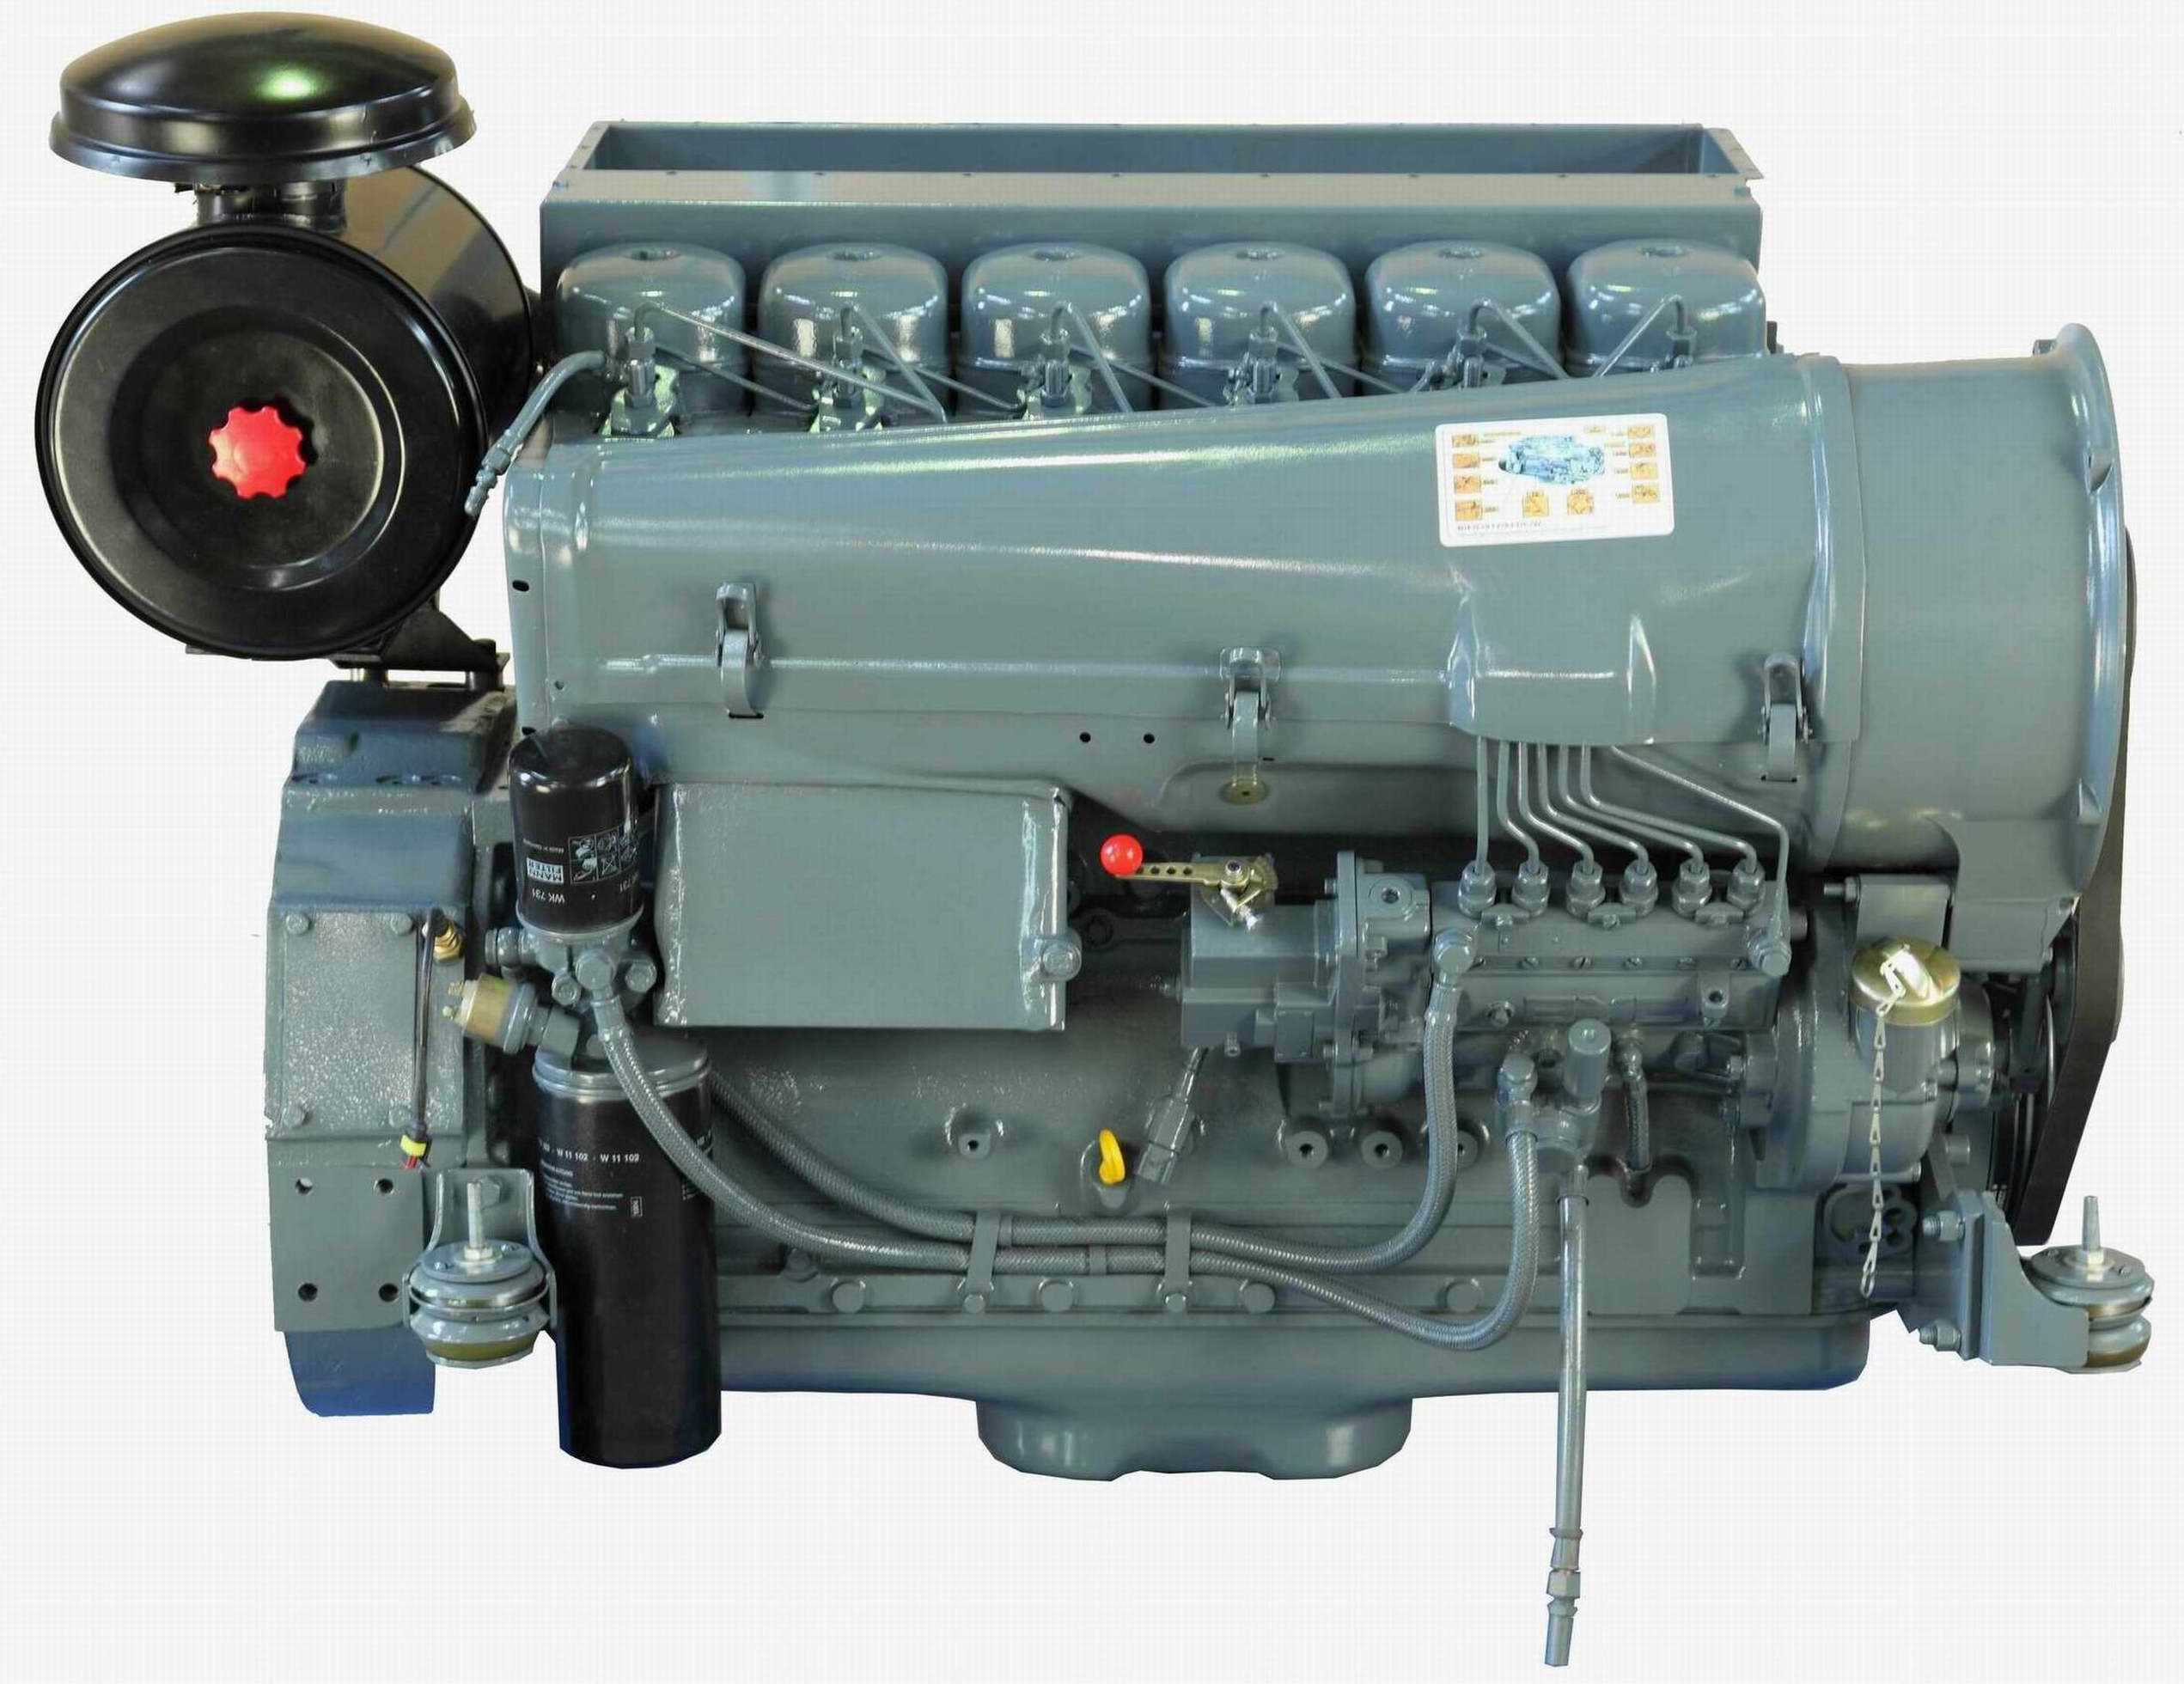 F6l912 Deutz Diesel Engine Auto Electrical Wiring Diagram Air Cooled